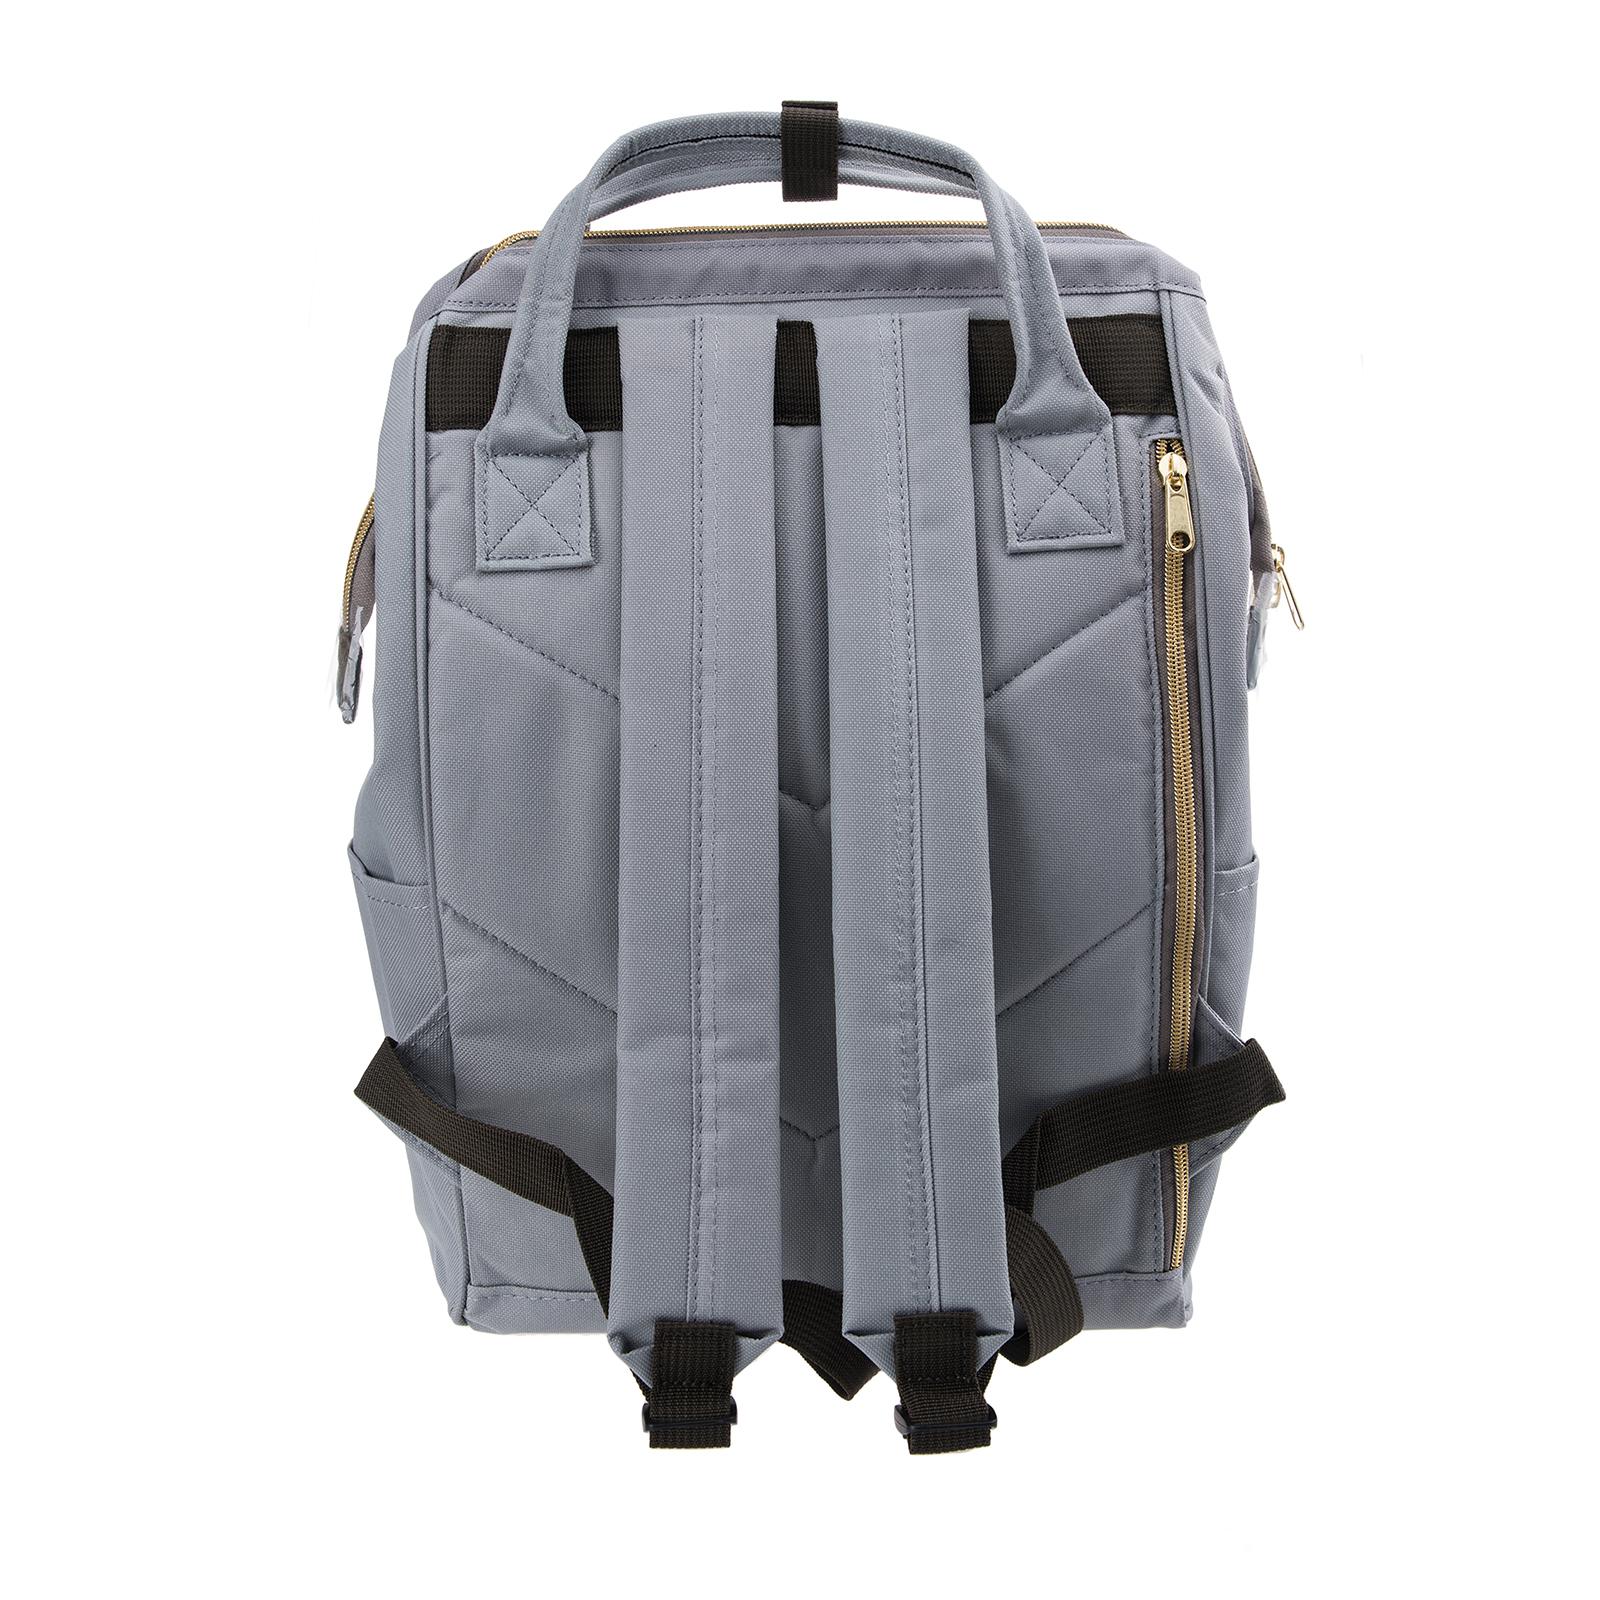 Anello Official Japan Light Grey Regular Backpack Rucksack Diaper Travel Bag image 4